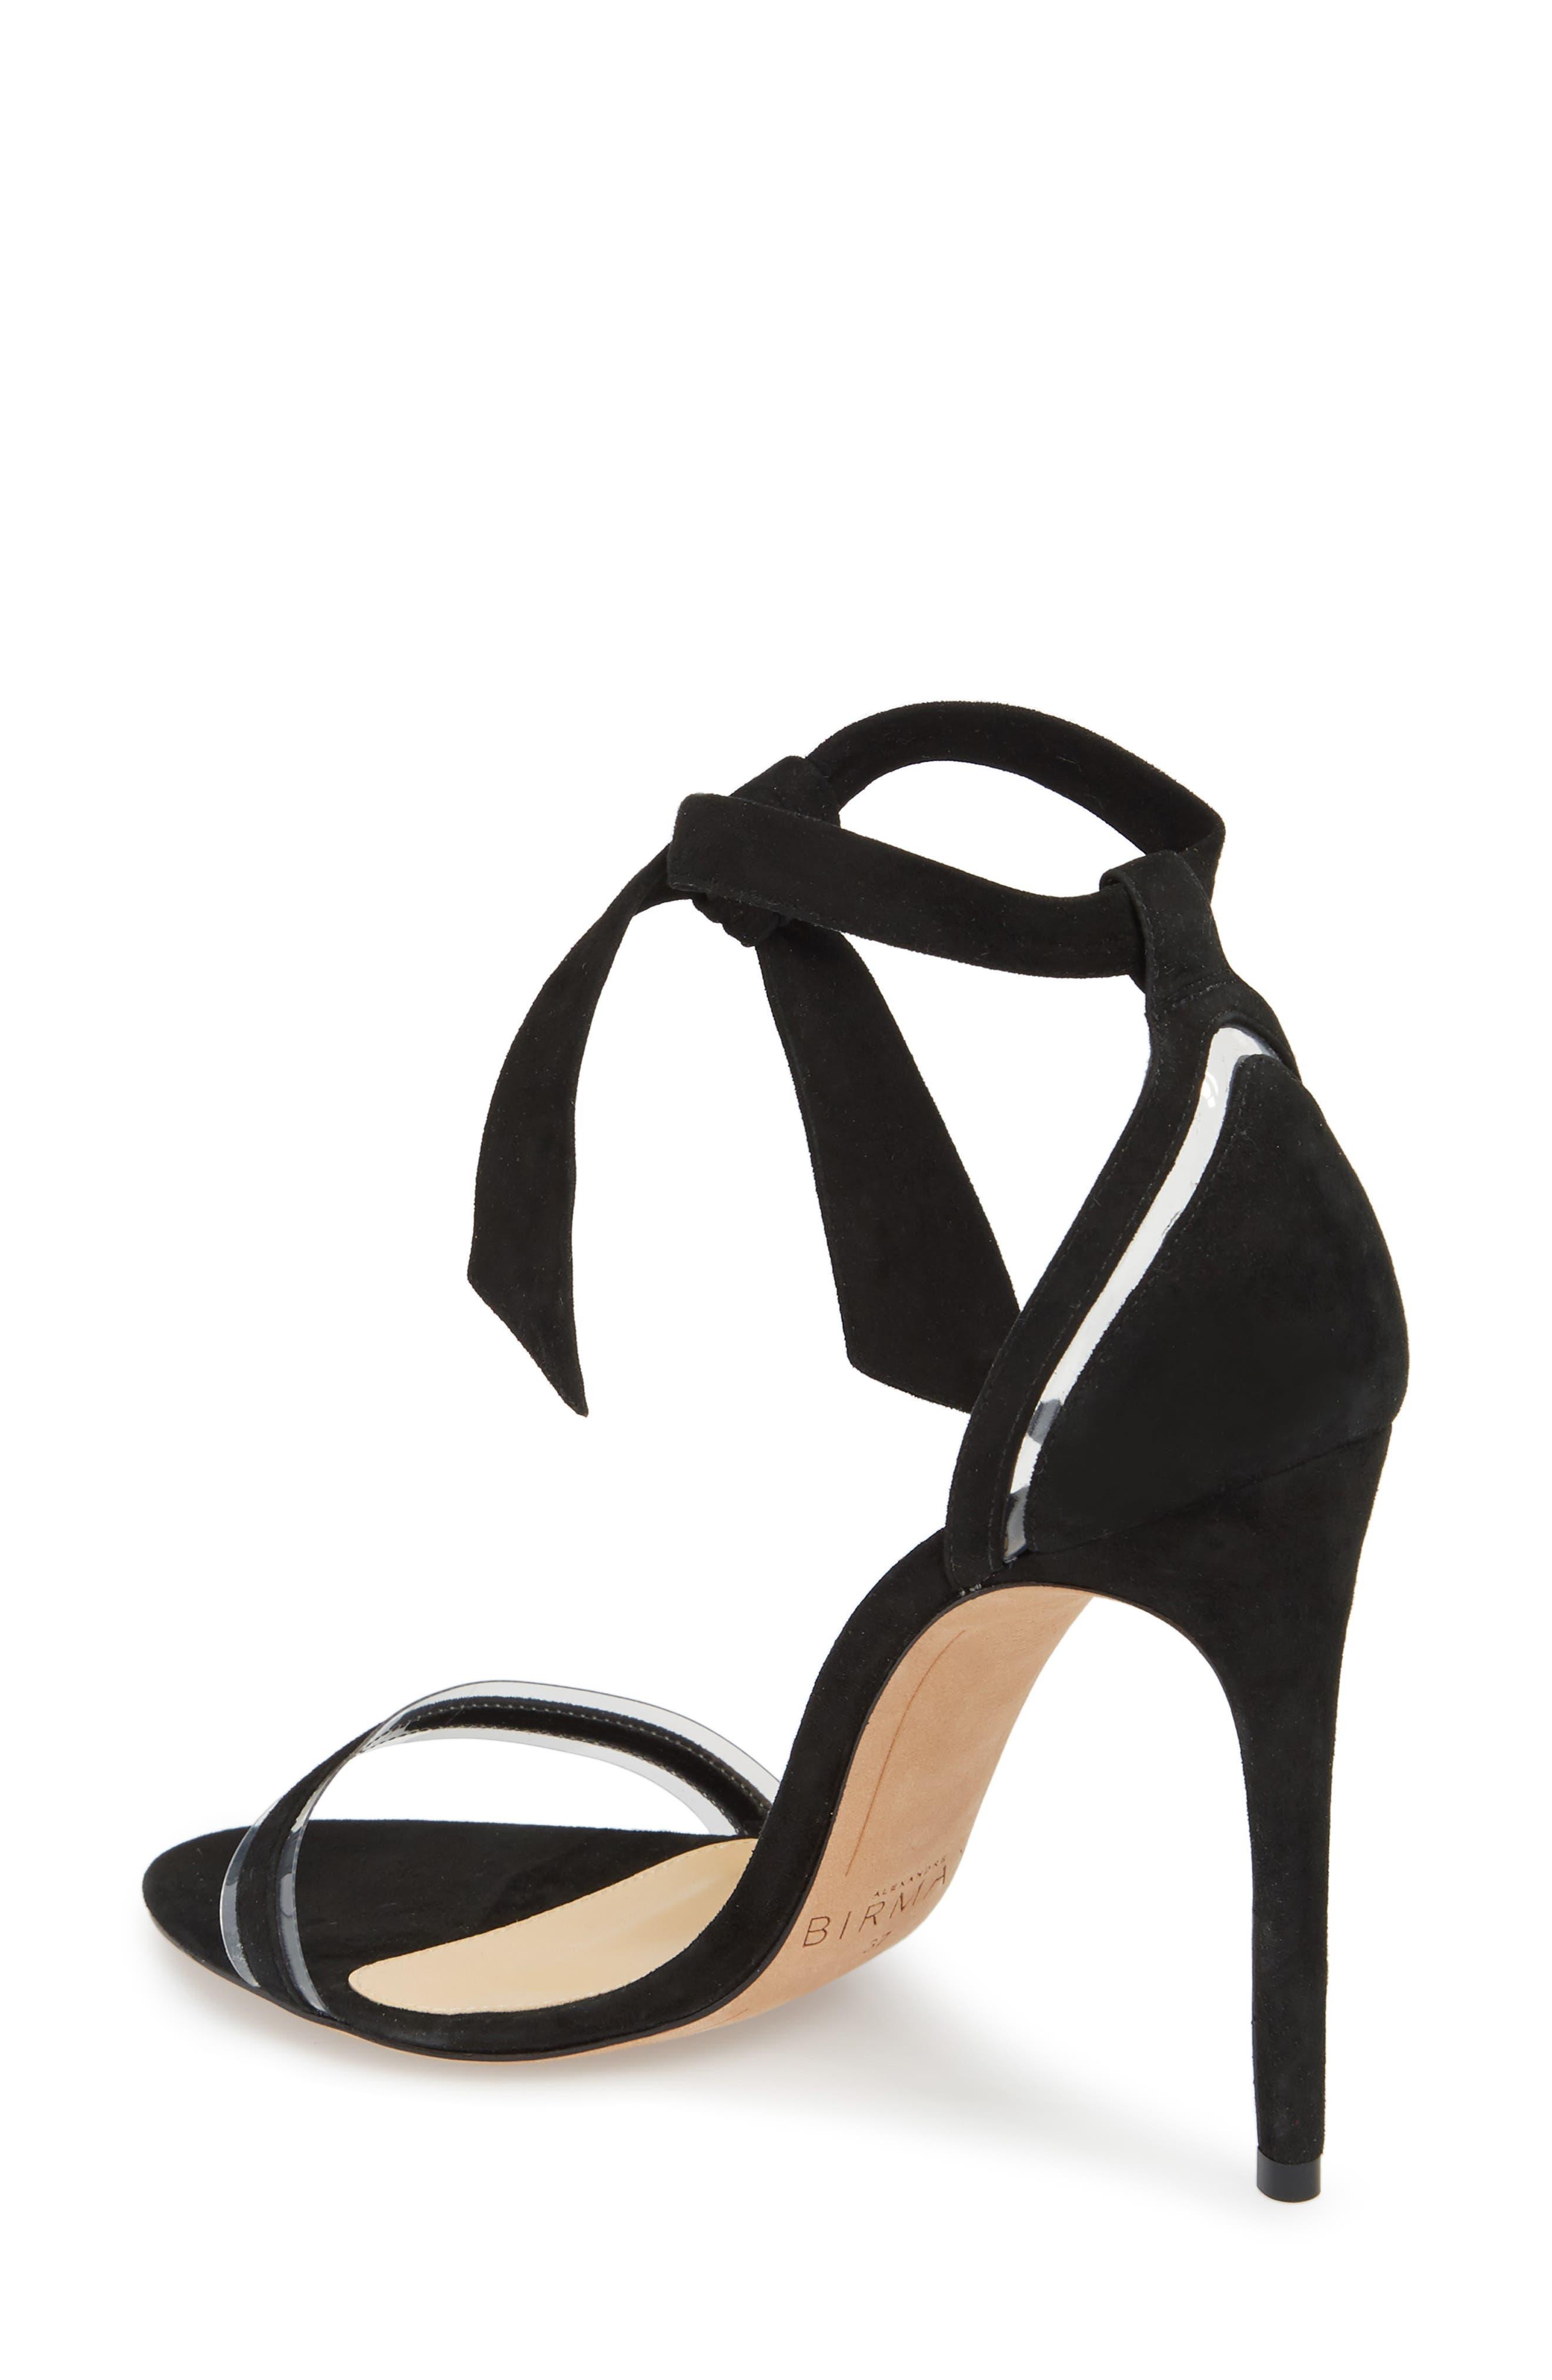 ALEXANDRE BIRMAN, Clarita Clear Ankle Tie Sandal, Alternate thumbnail 2, color, BLACK/ TRANSPARENT